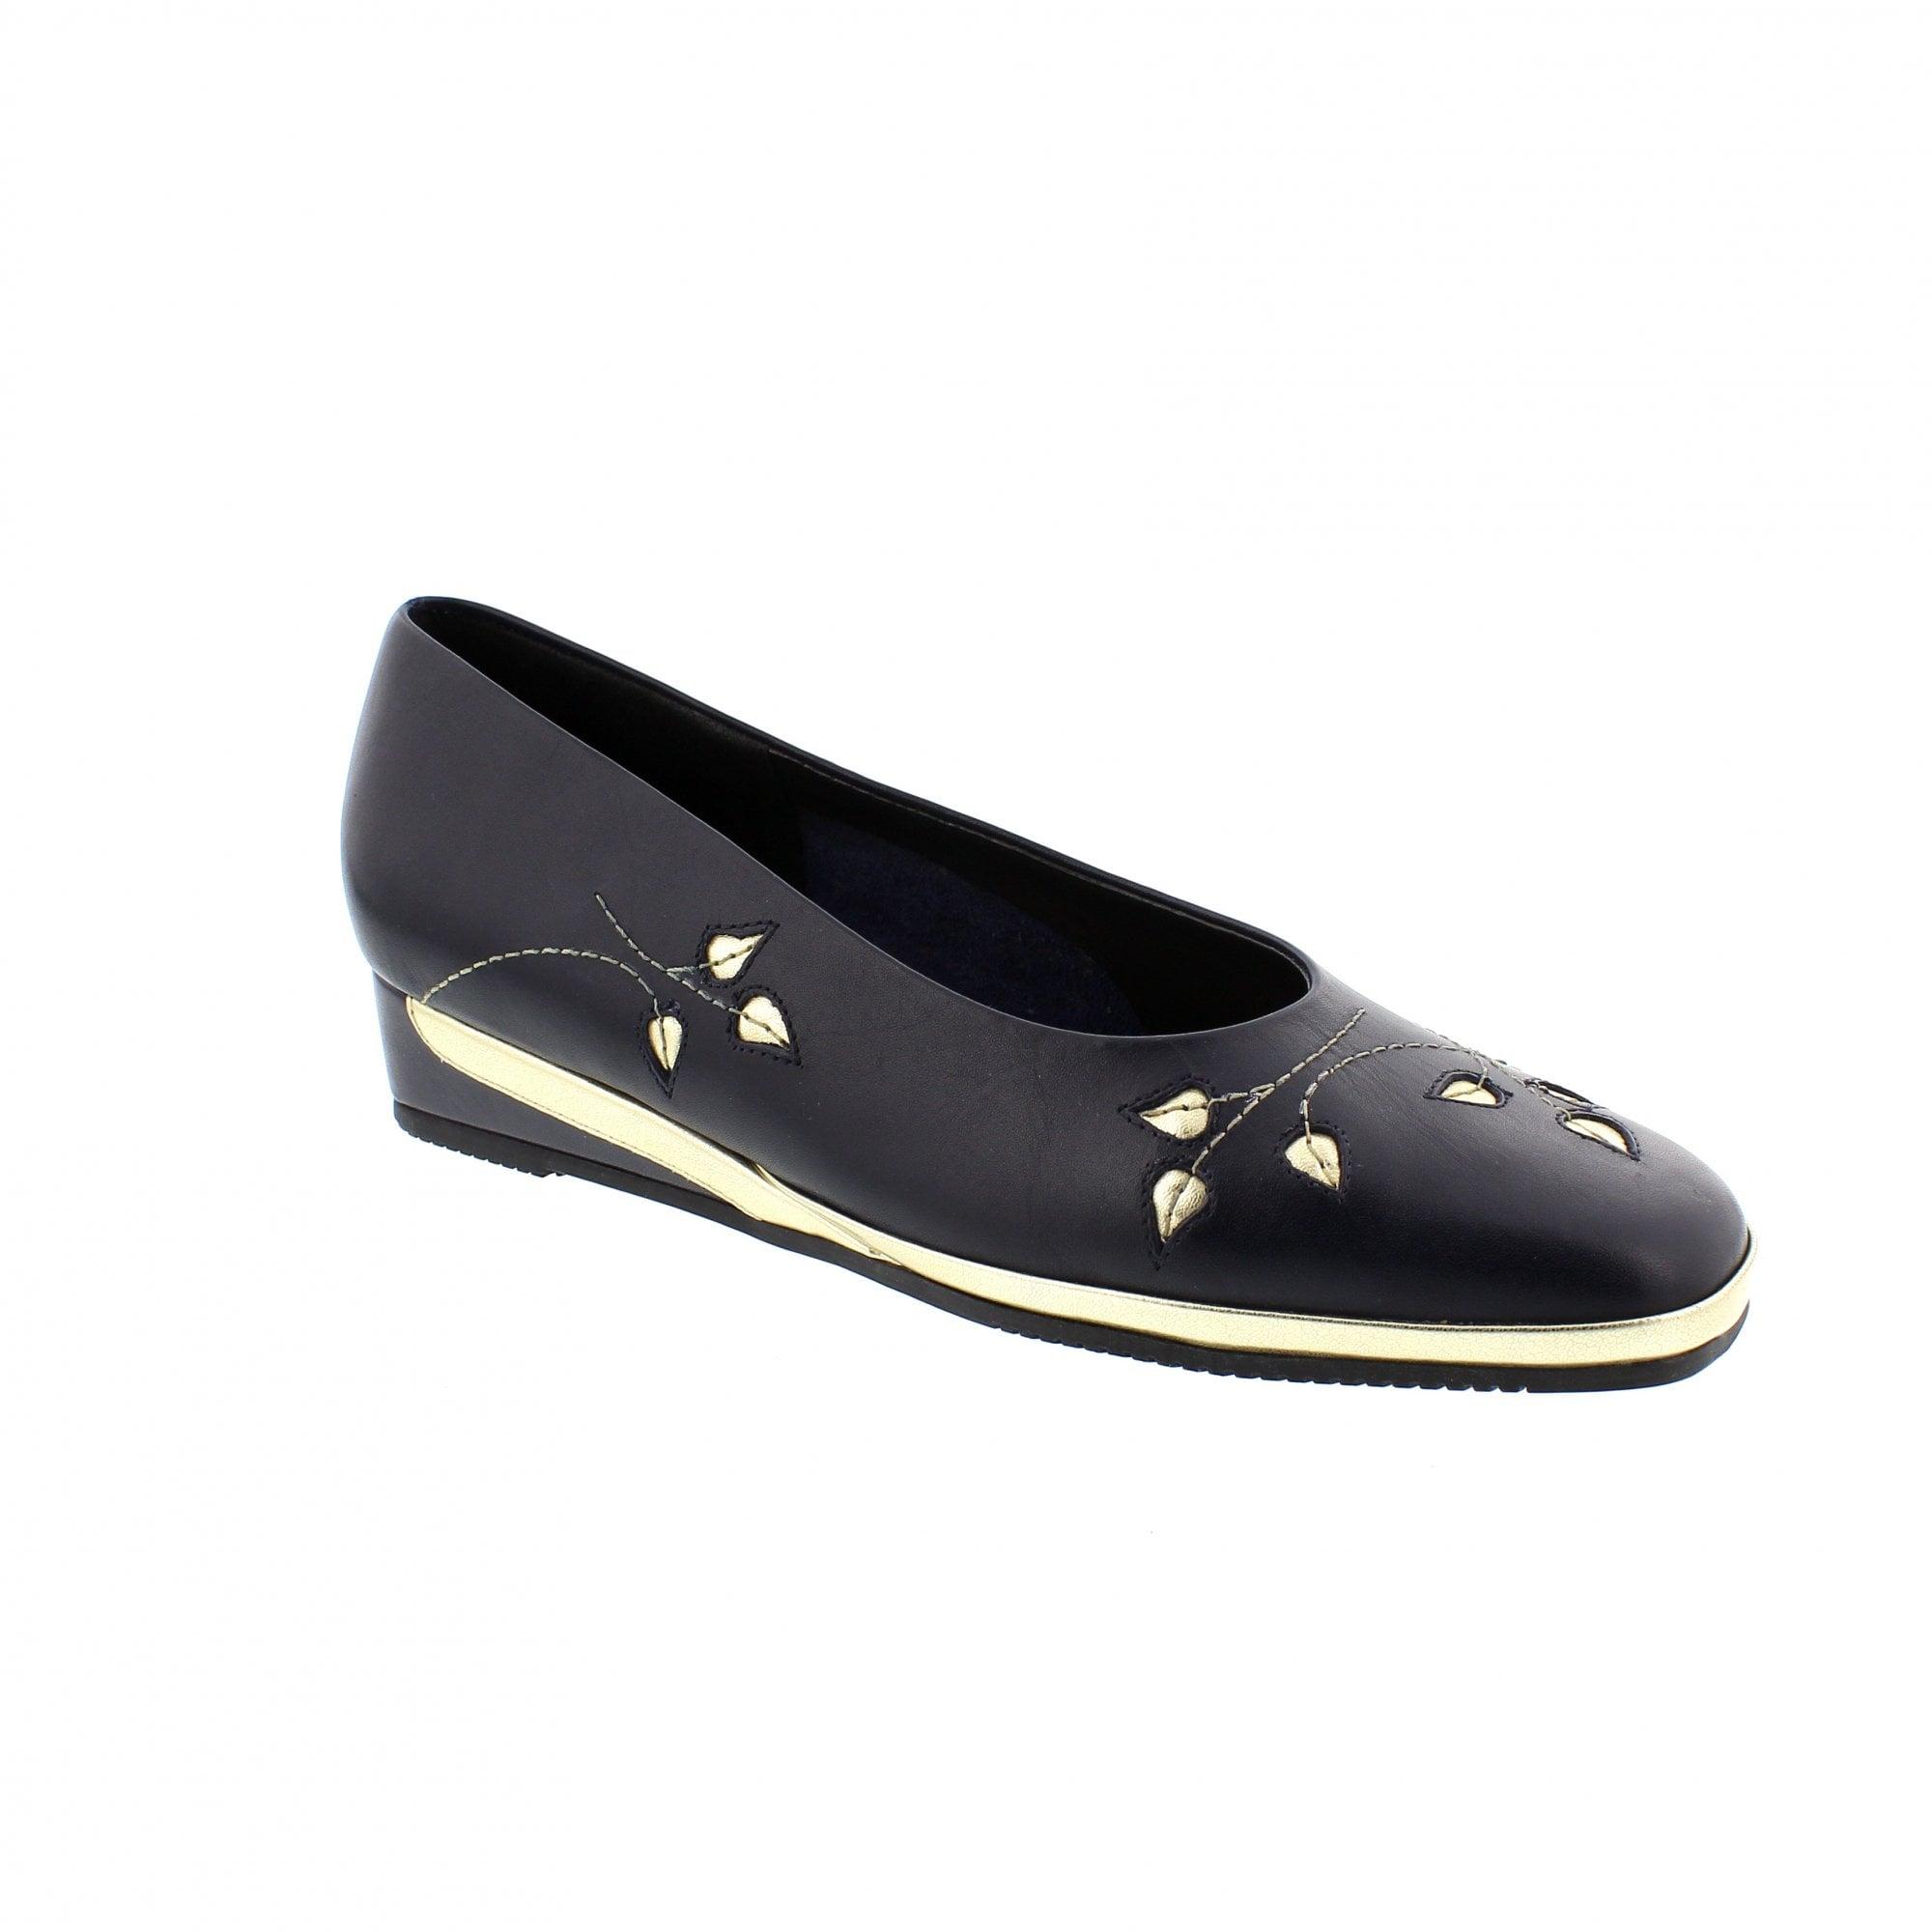 298b48abbaaac5 Van Dal Venice II 1367450 Womens Shoes